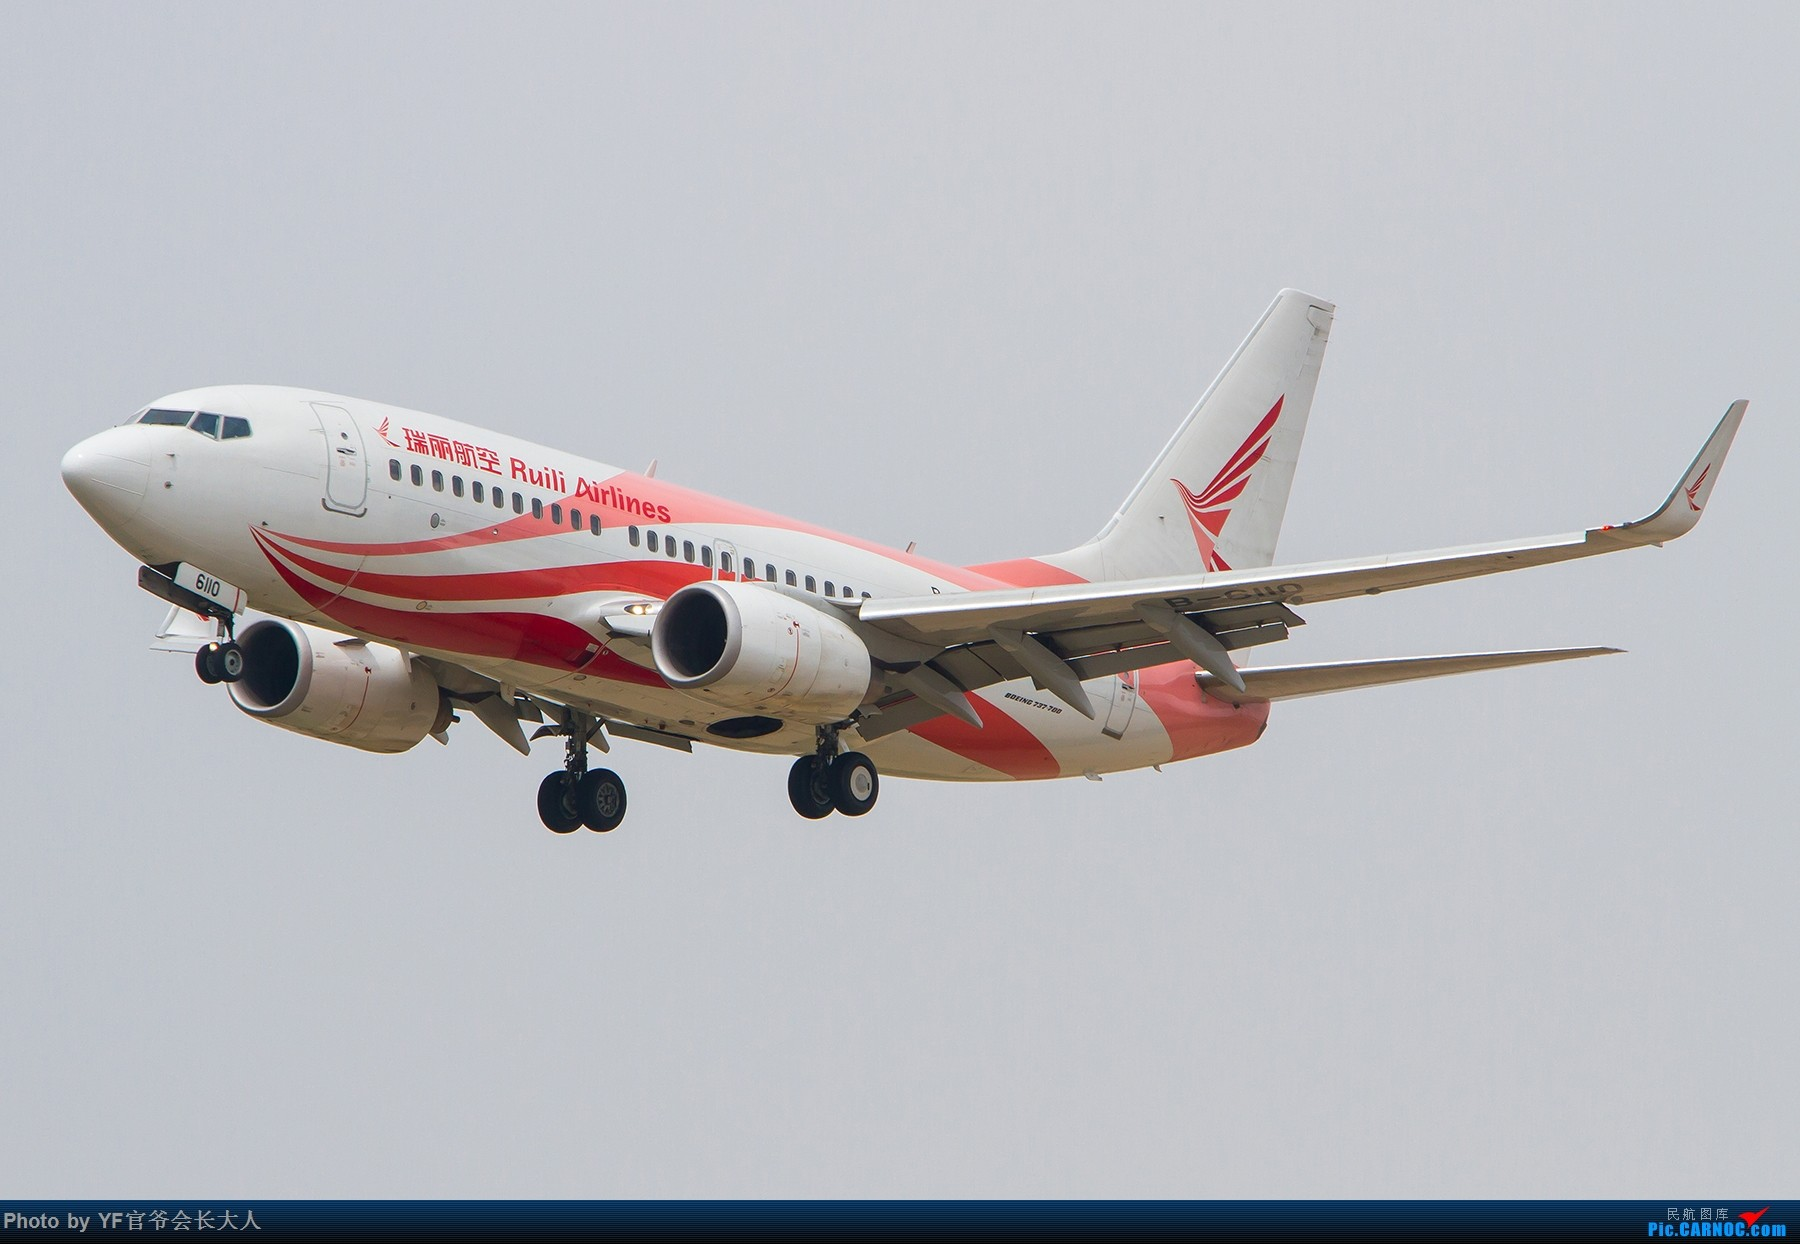 Re:[原创]【ZYTX】轻易不拍机,拍就要拍个过瘾!(新开的酷鸟,亚洲大西洋,顺带碰上朝韩两国的好货) BOEING 737-700 B-6110 中国沈阳桃仙国际机场